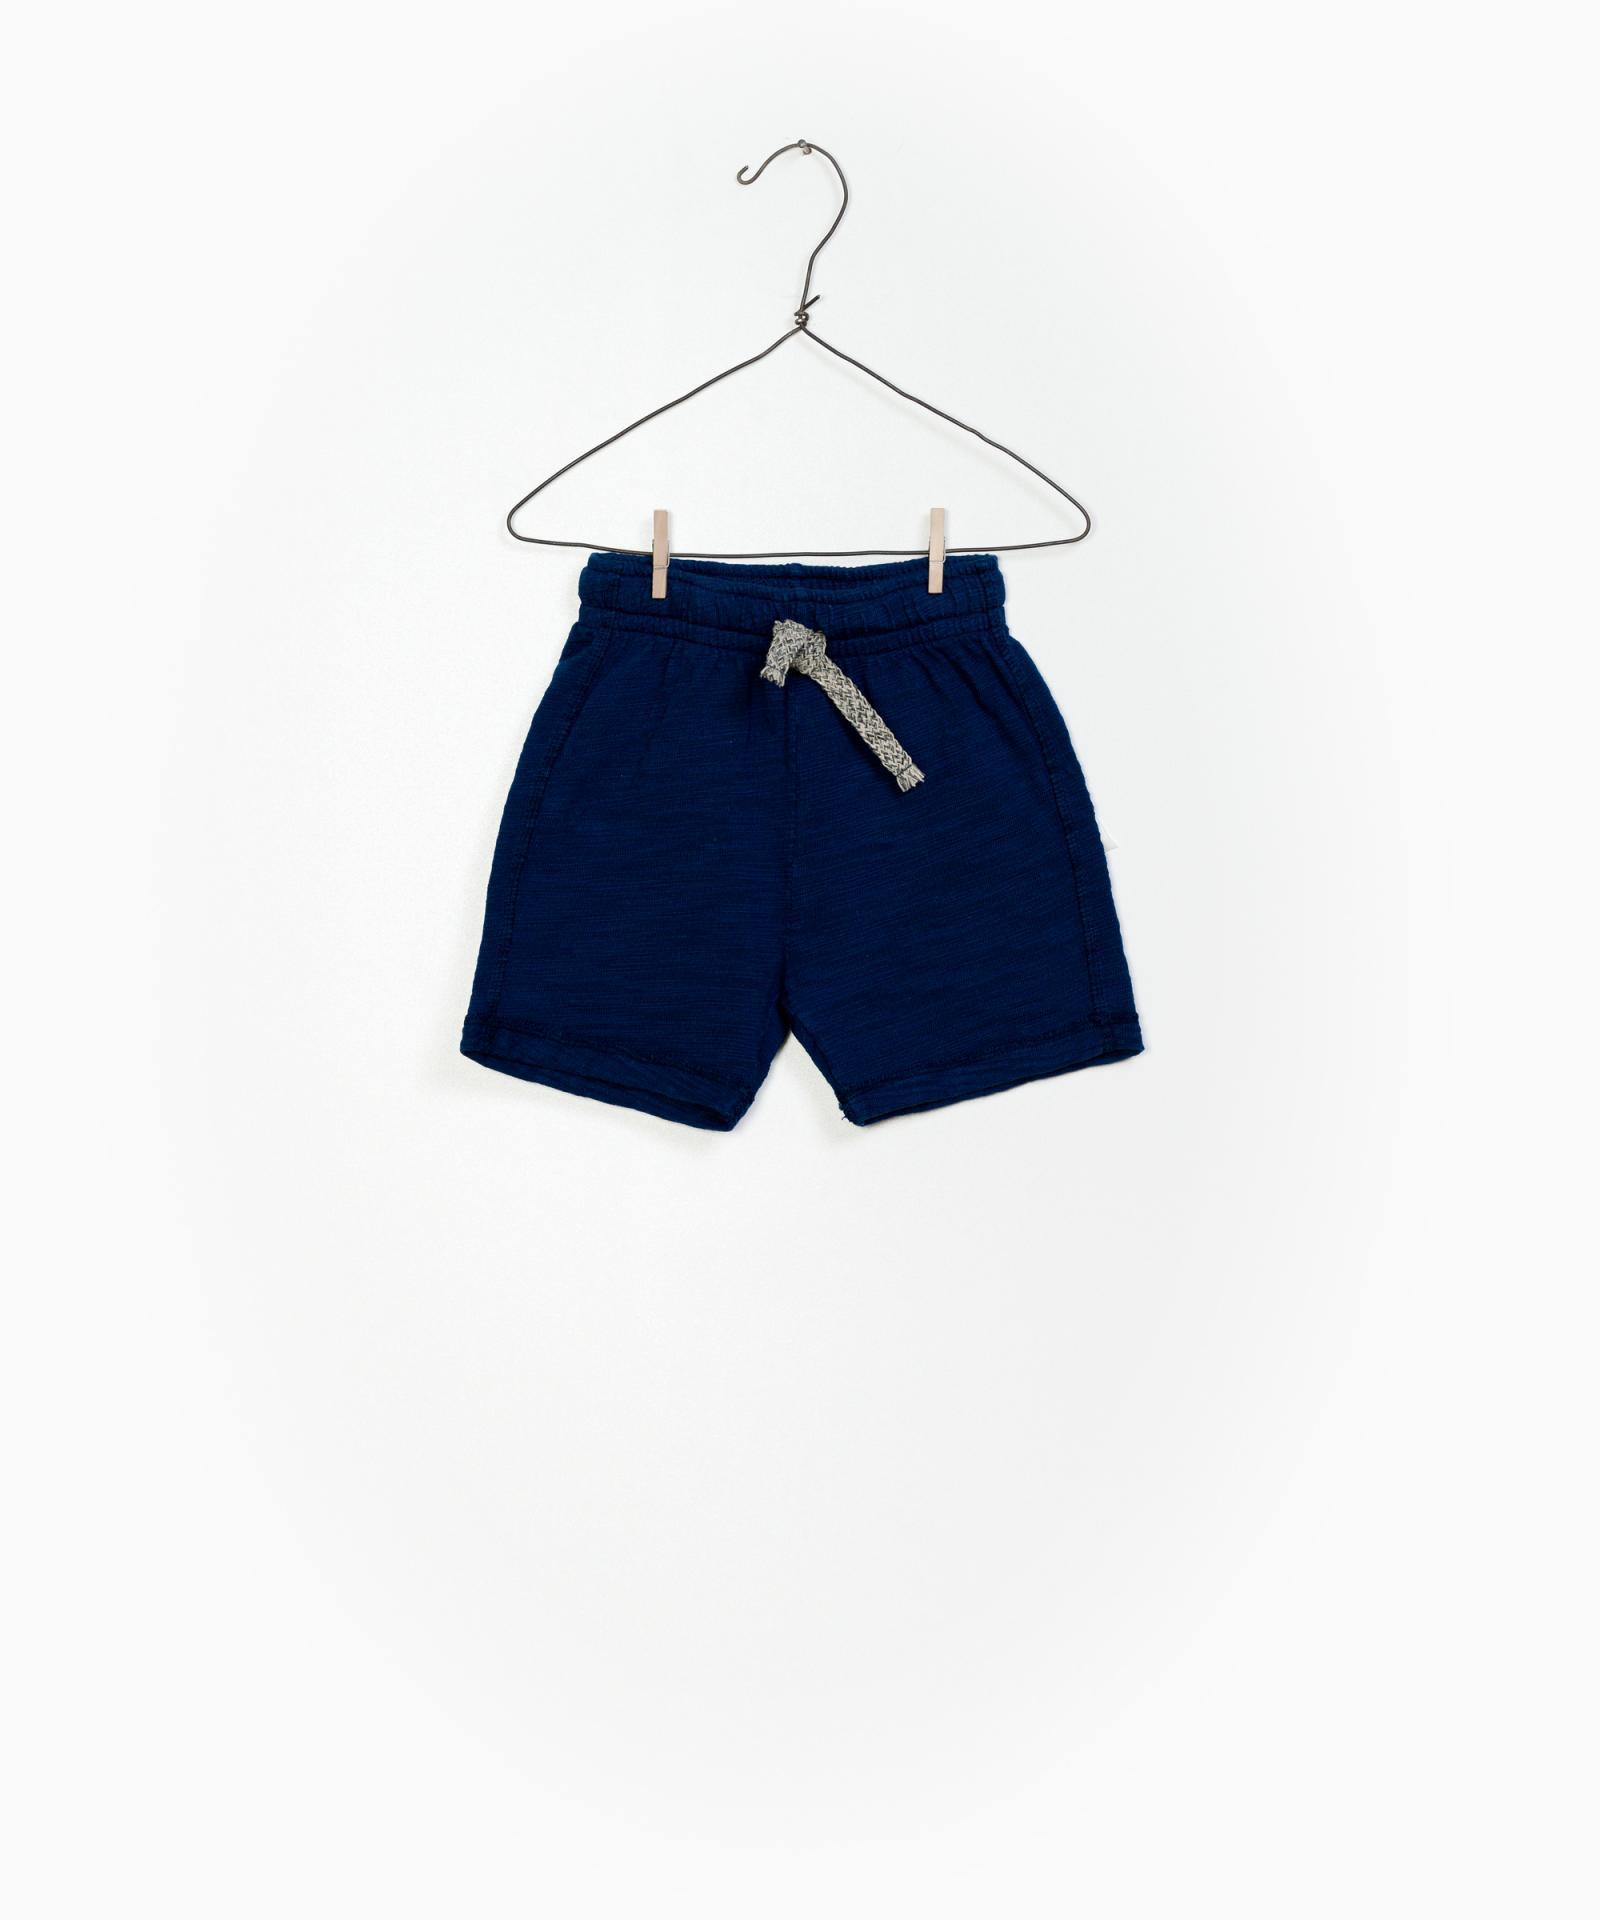 Pantalón corto Play Up